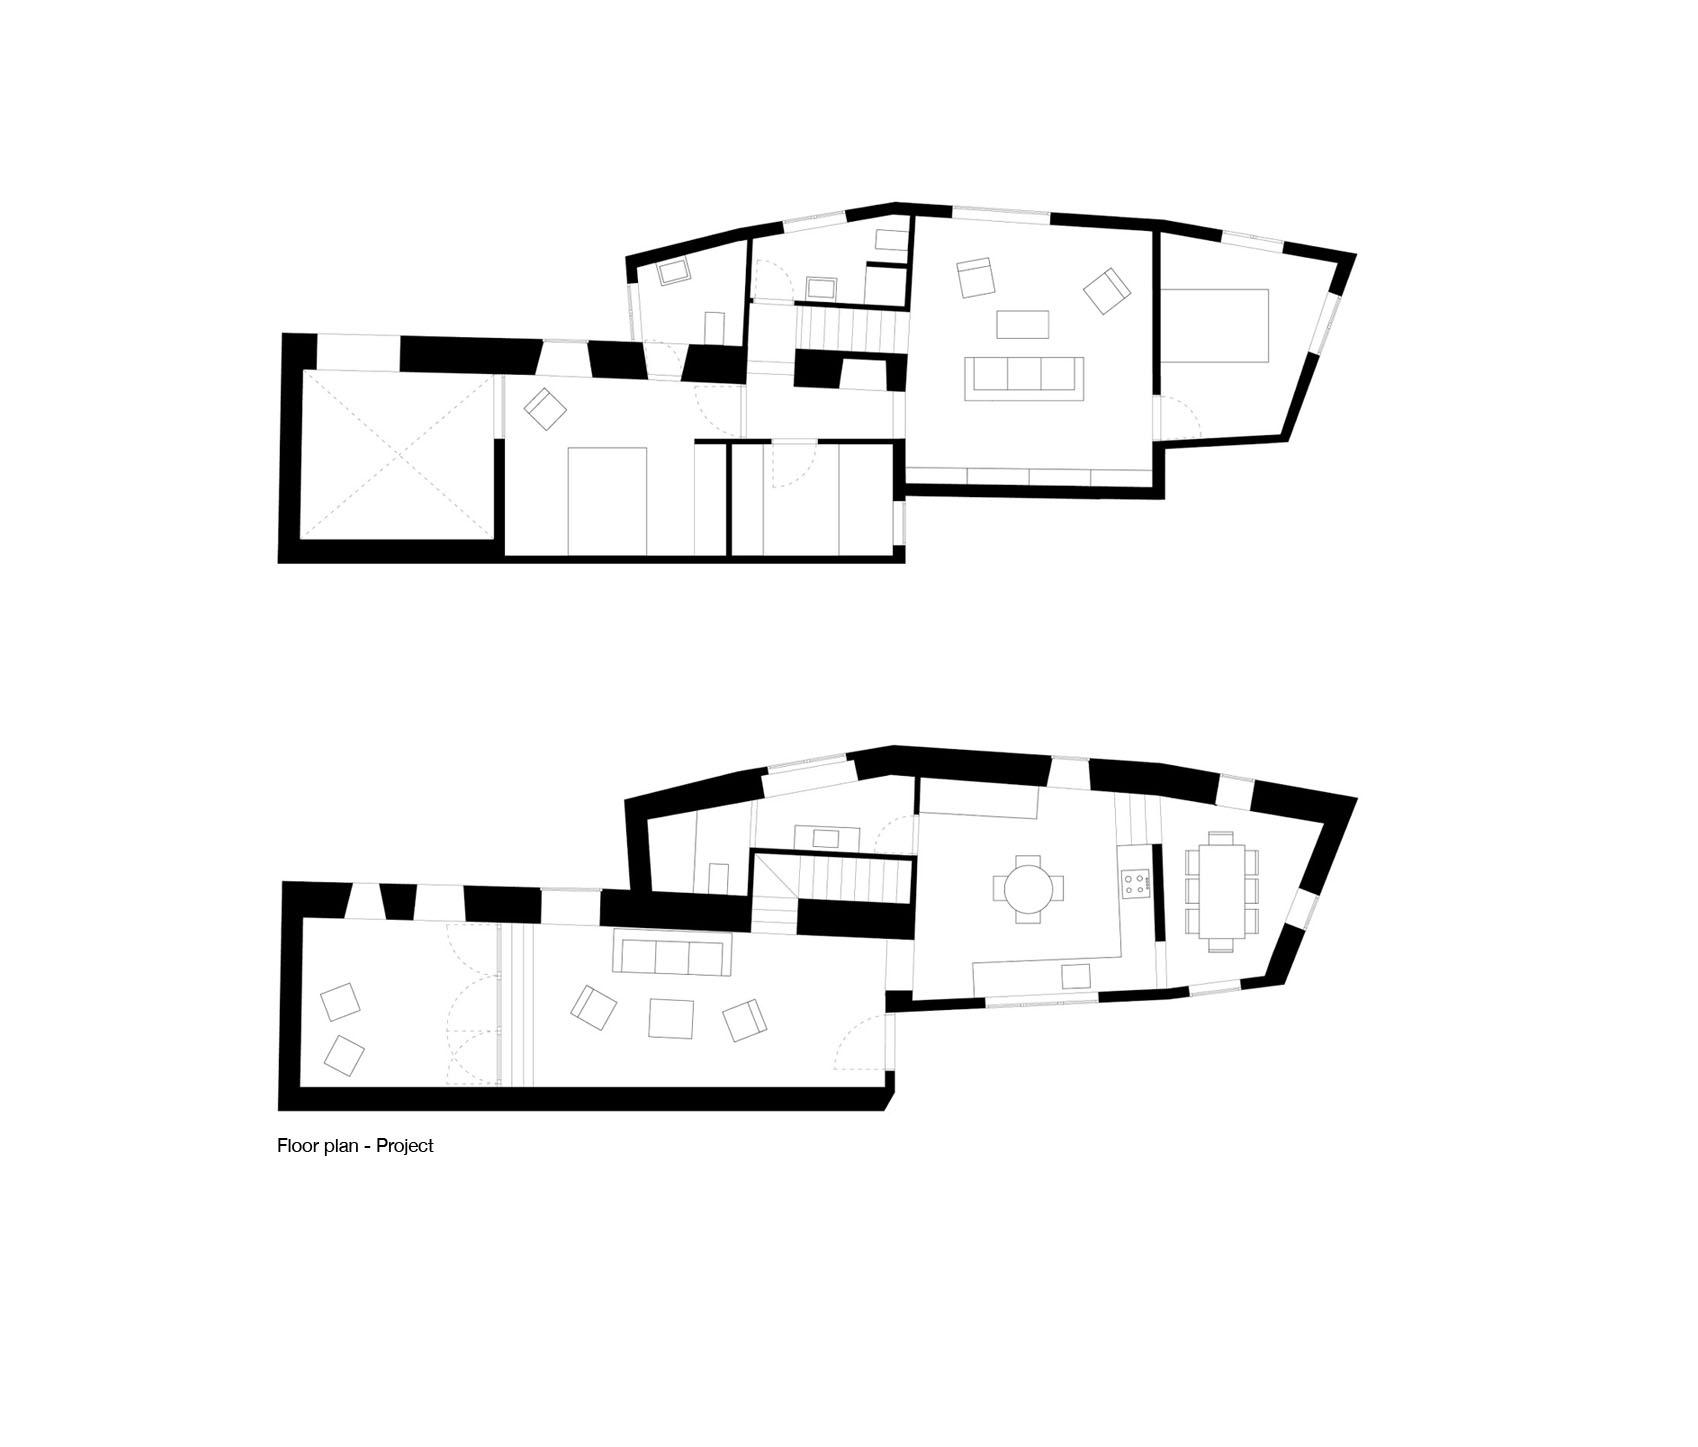 Private House-Celorio-Image 06.jpg